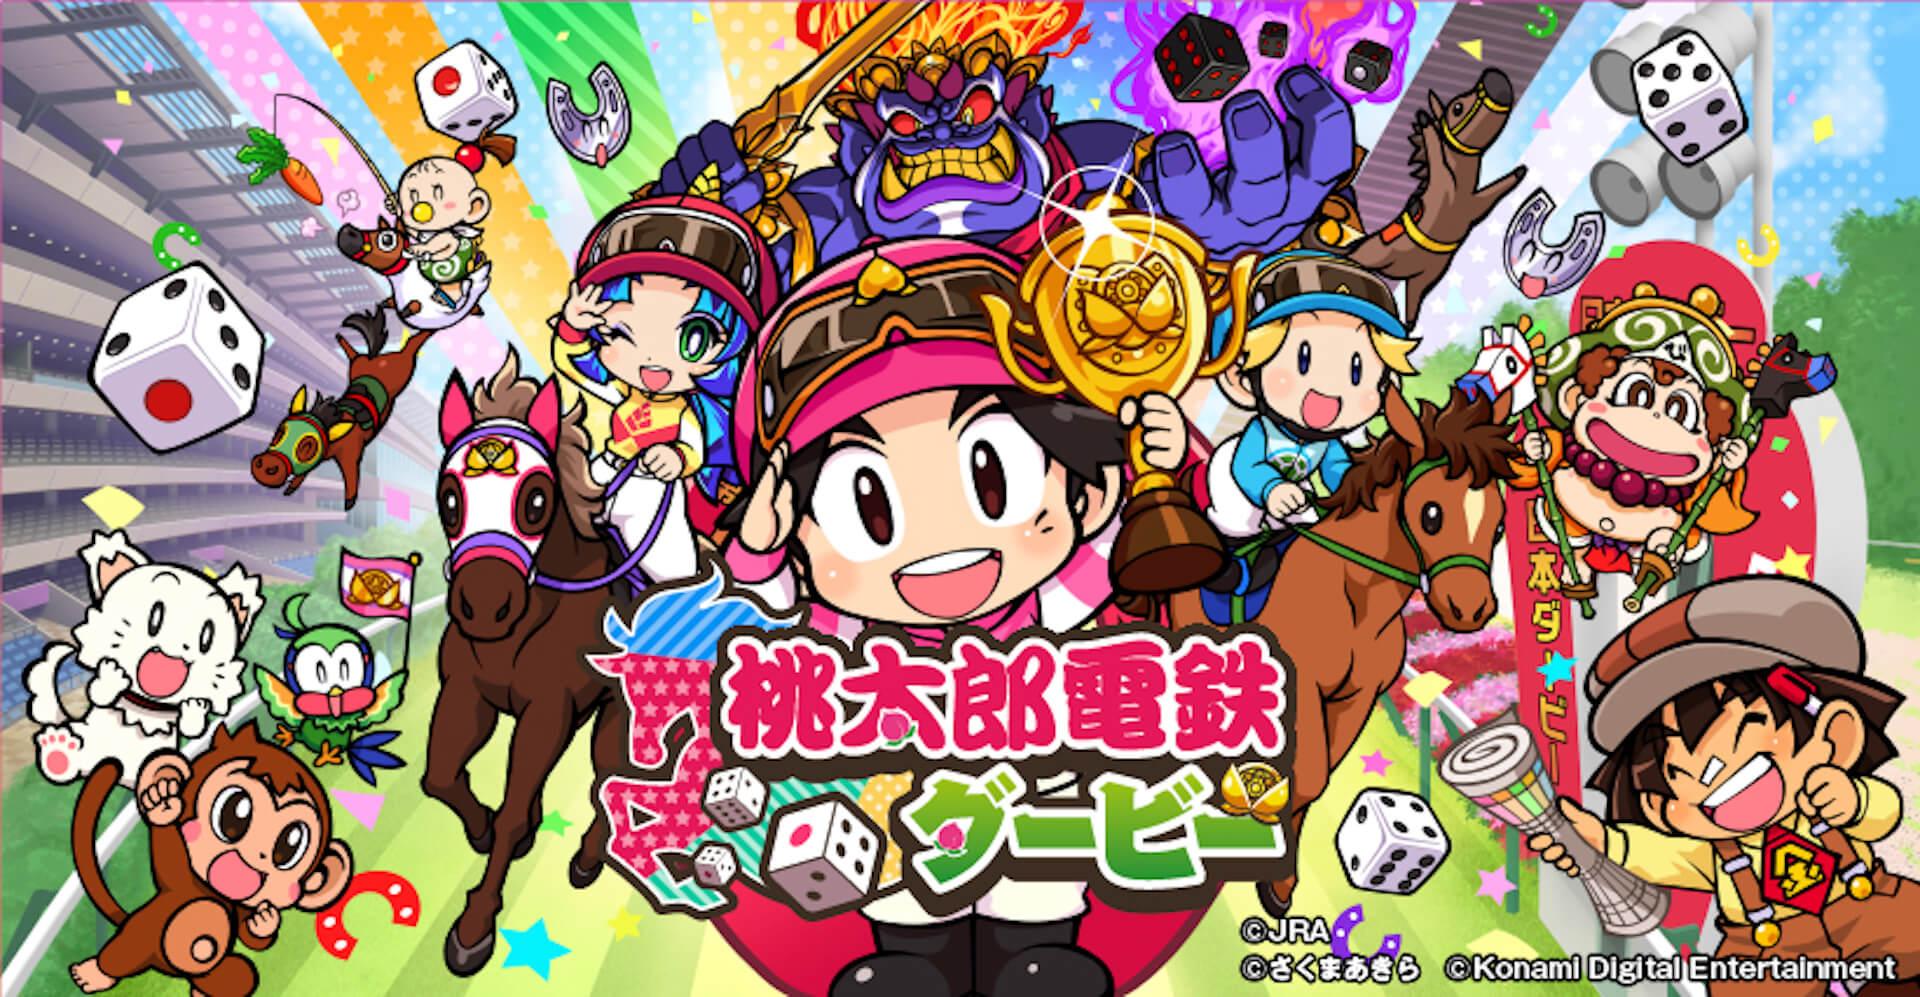 JRAと桃太郎電鉄が日本ダービーでコラボ!1万円分の電子マネーギフトが当たるTwitterキャンペーンも実施 tech210517_jra-momotetsu-210517_10